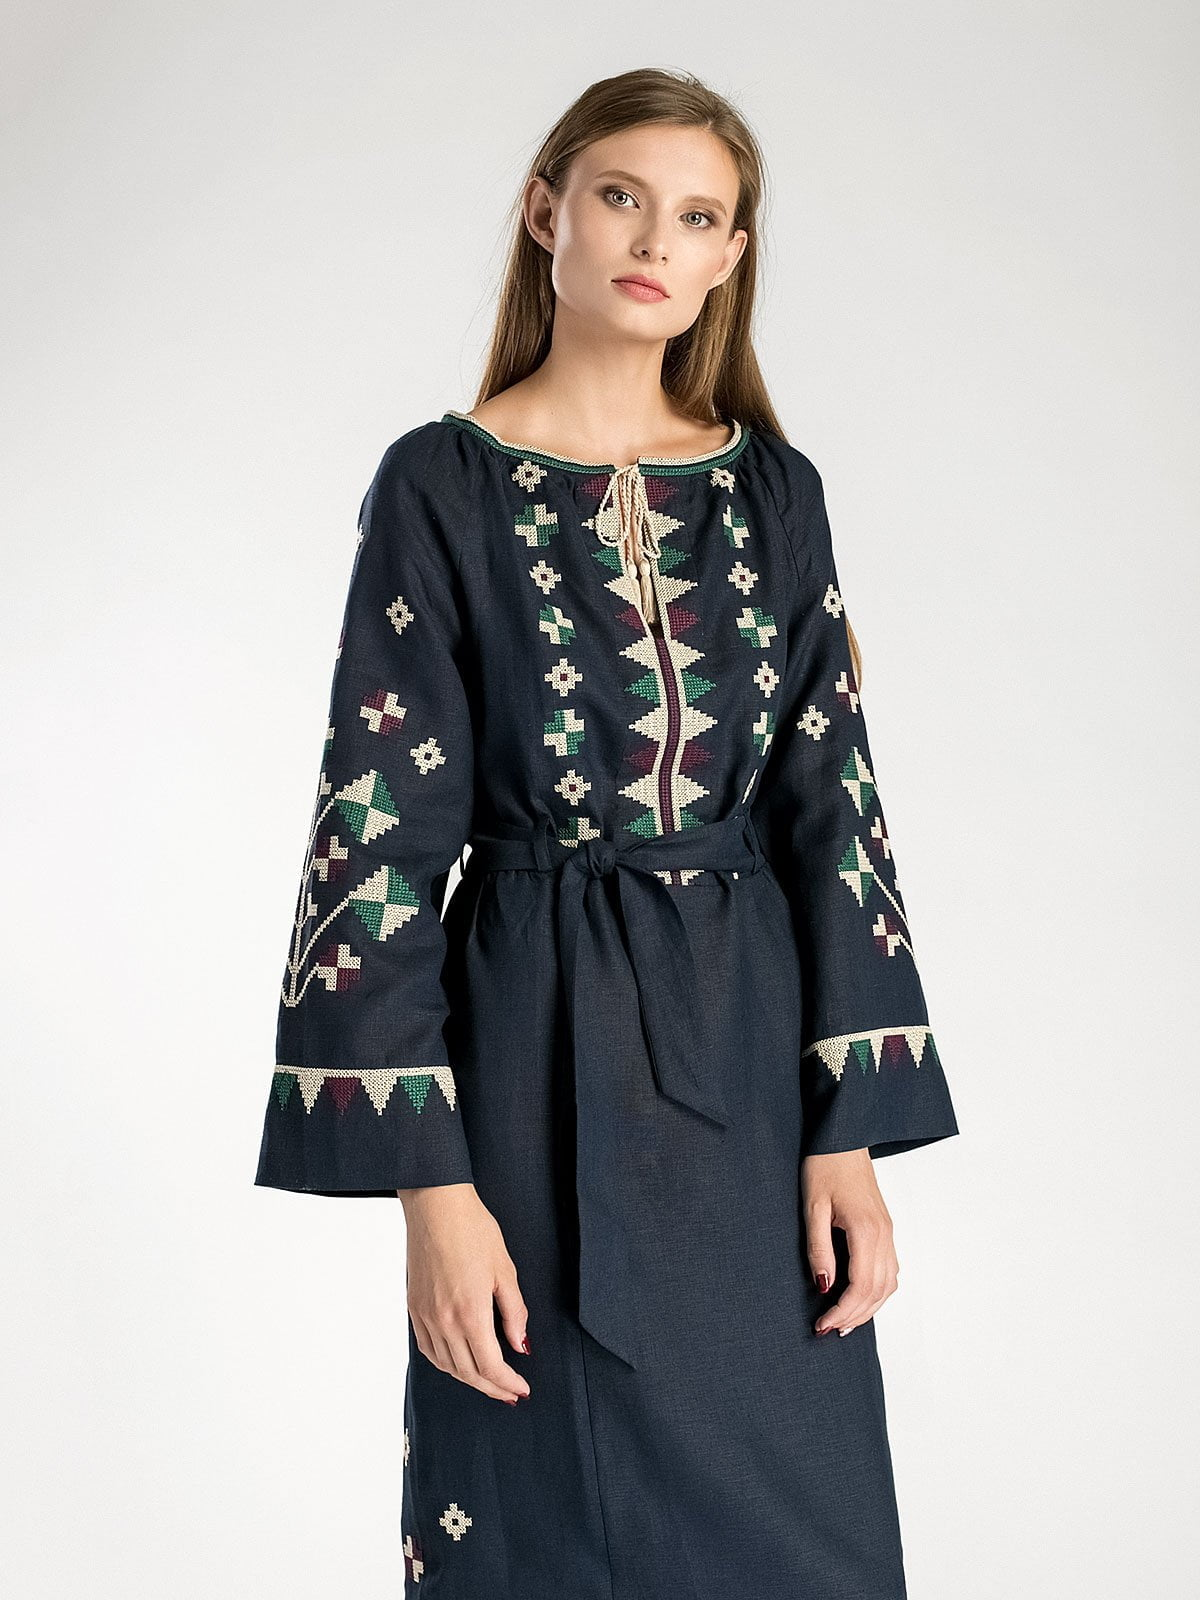 Темно-синее длинное вышитое платье под пояс ETHNO4. Темно-синя довга вишита  сукня під ... 83f14513c5c5c